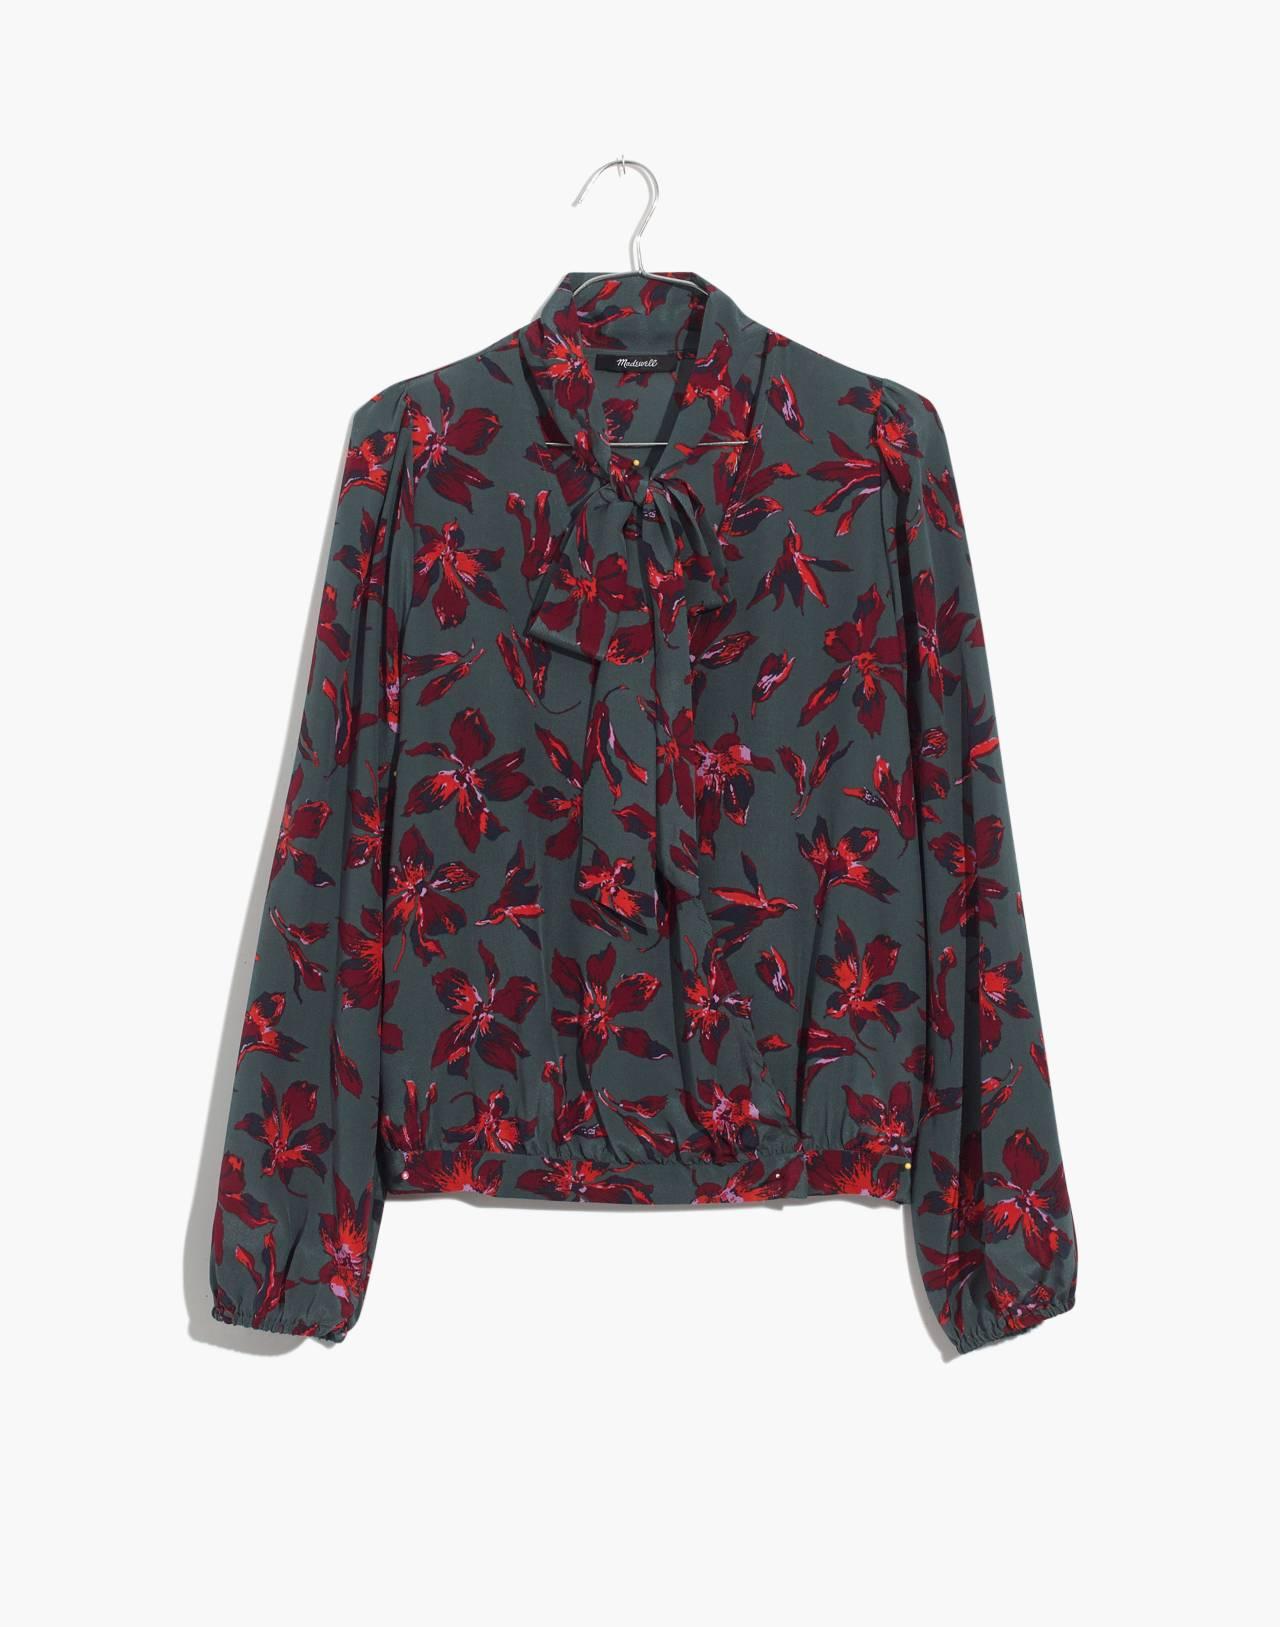 Silk Tie-Neck Wrap Top in Winter Orchid in brigette architect green image 4